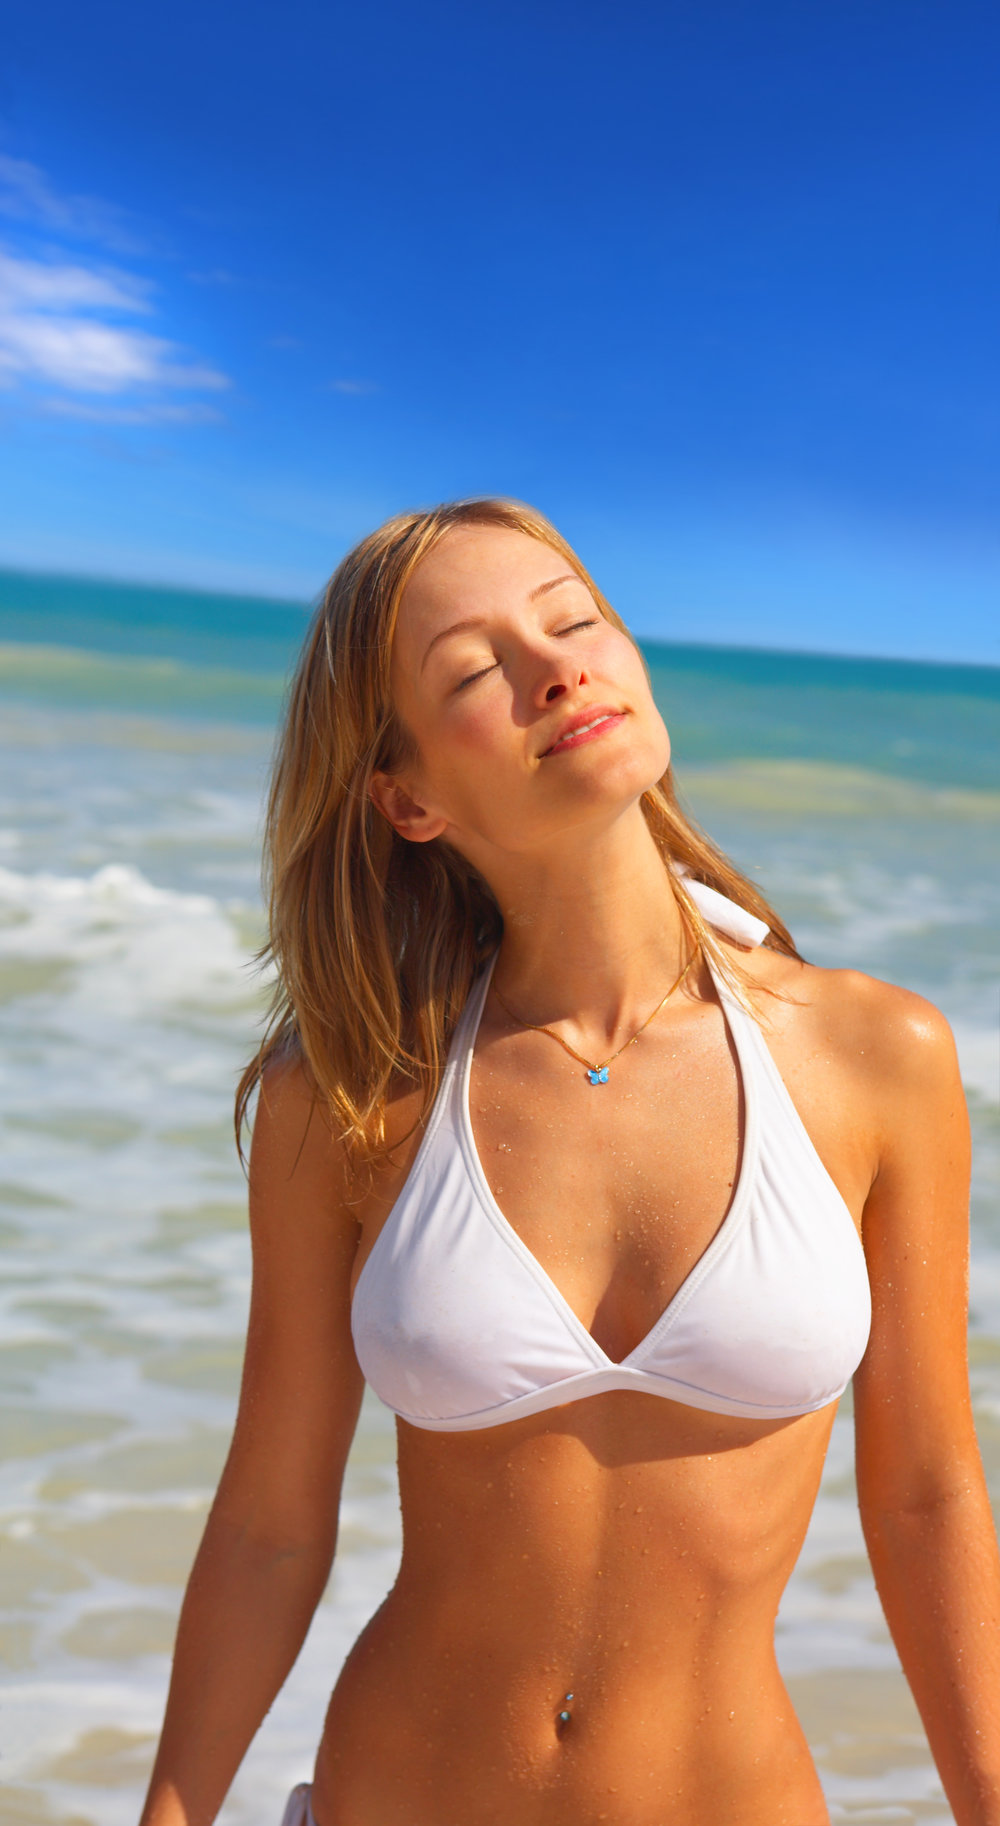 Image 5 Tan Woman on Beach.jpg